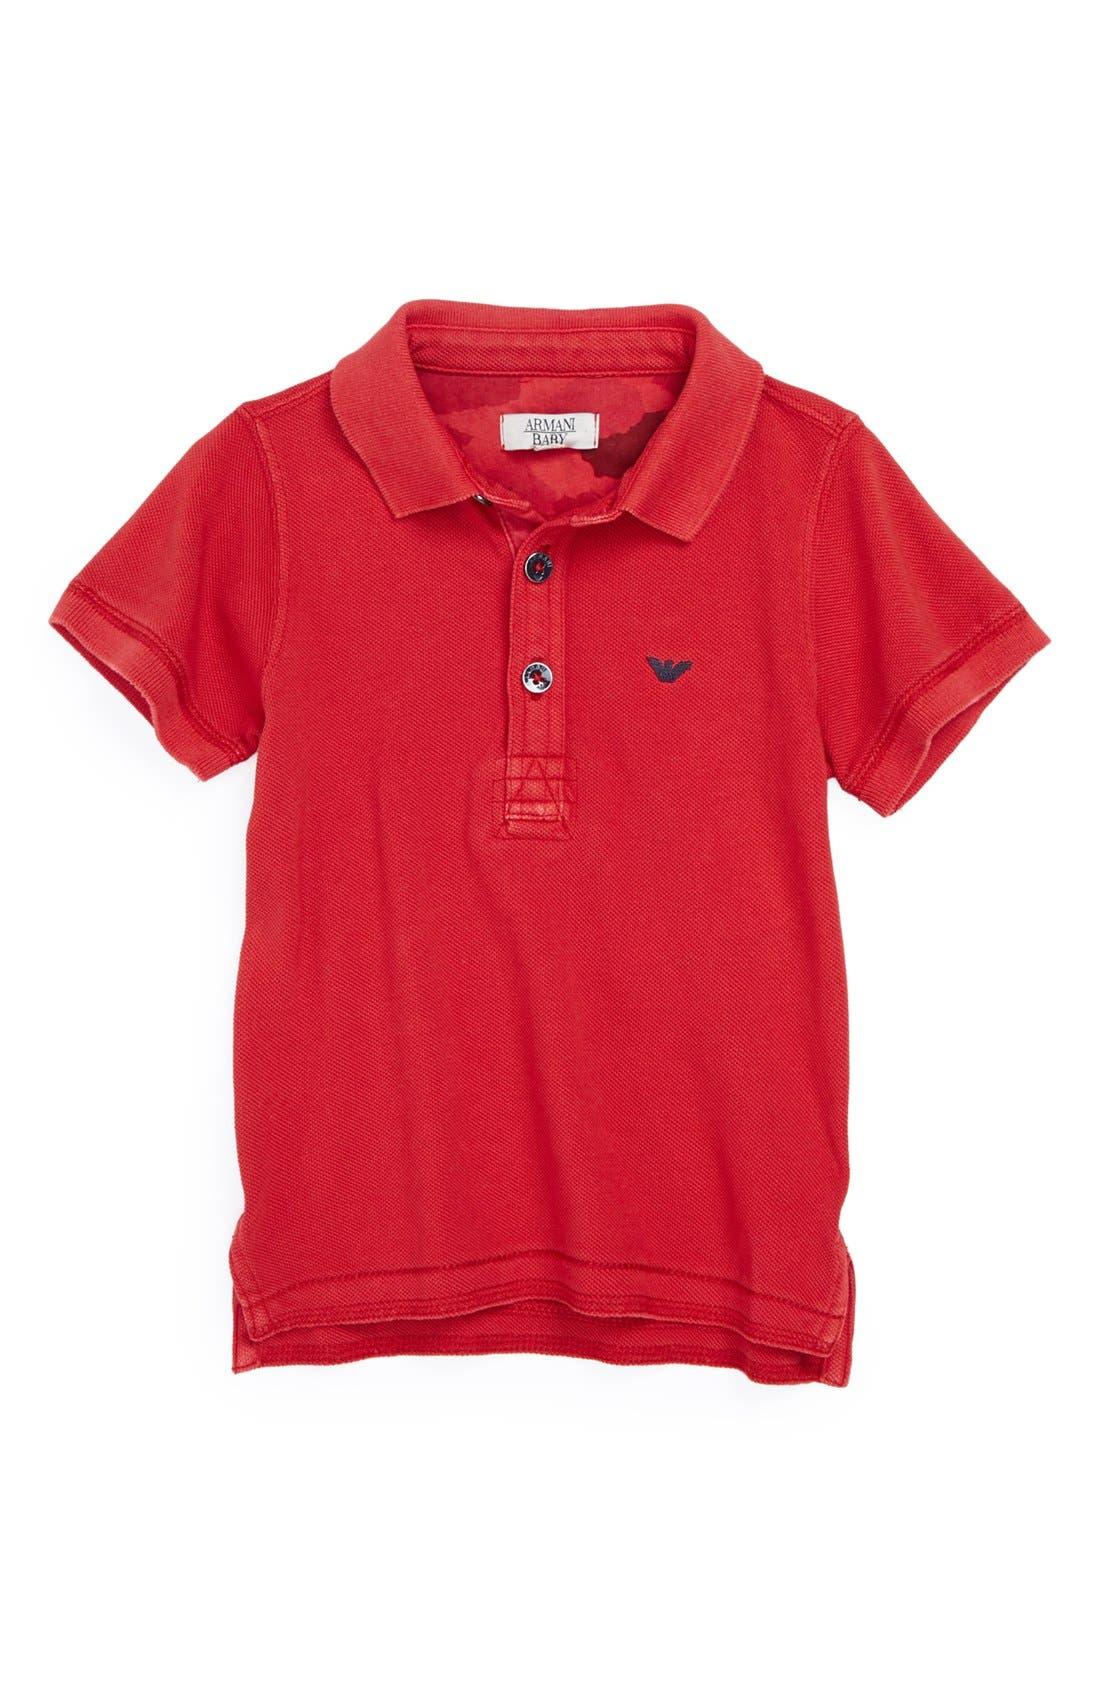 Alternate Image 1 Selected - Armani Junior Cotton Logo Polo (Baby Boys)